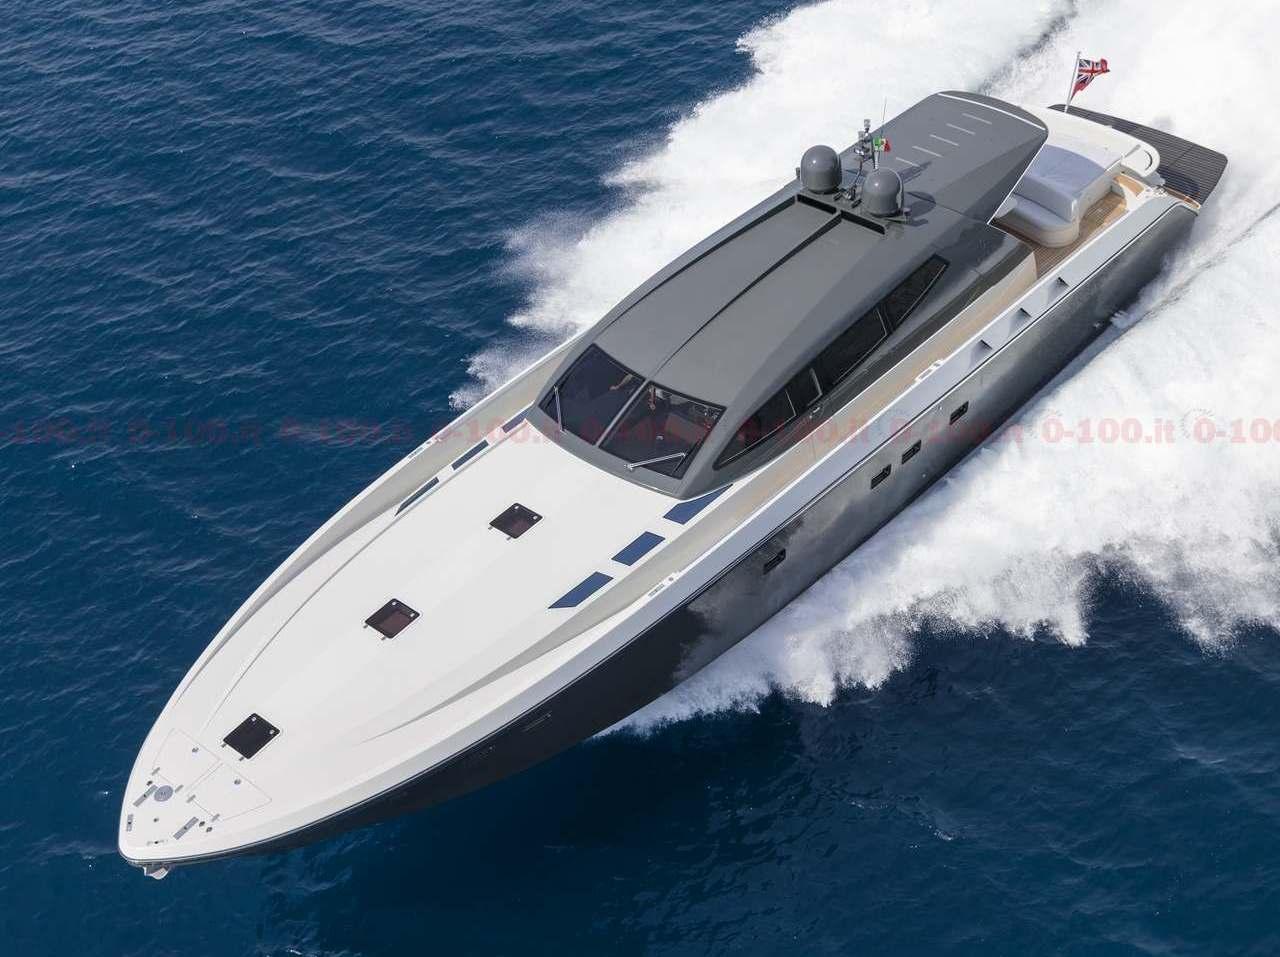 Cannes Yachting Festival 2017 OTAM Millennium 80 HT MegaYacht MYSTERE_0-1002